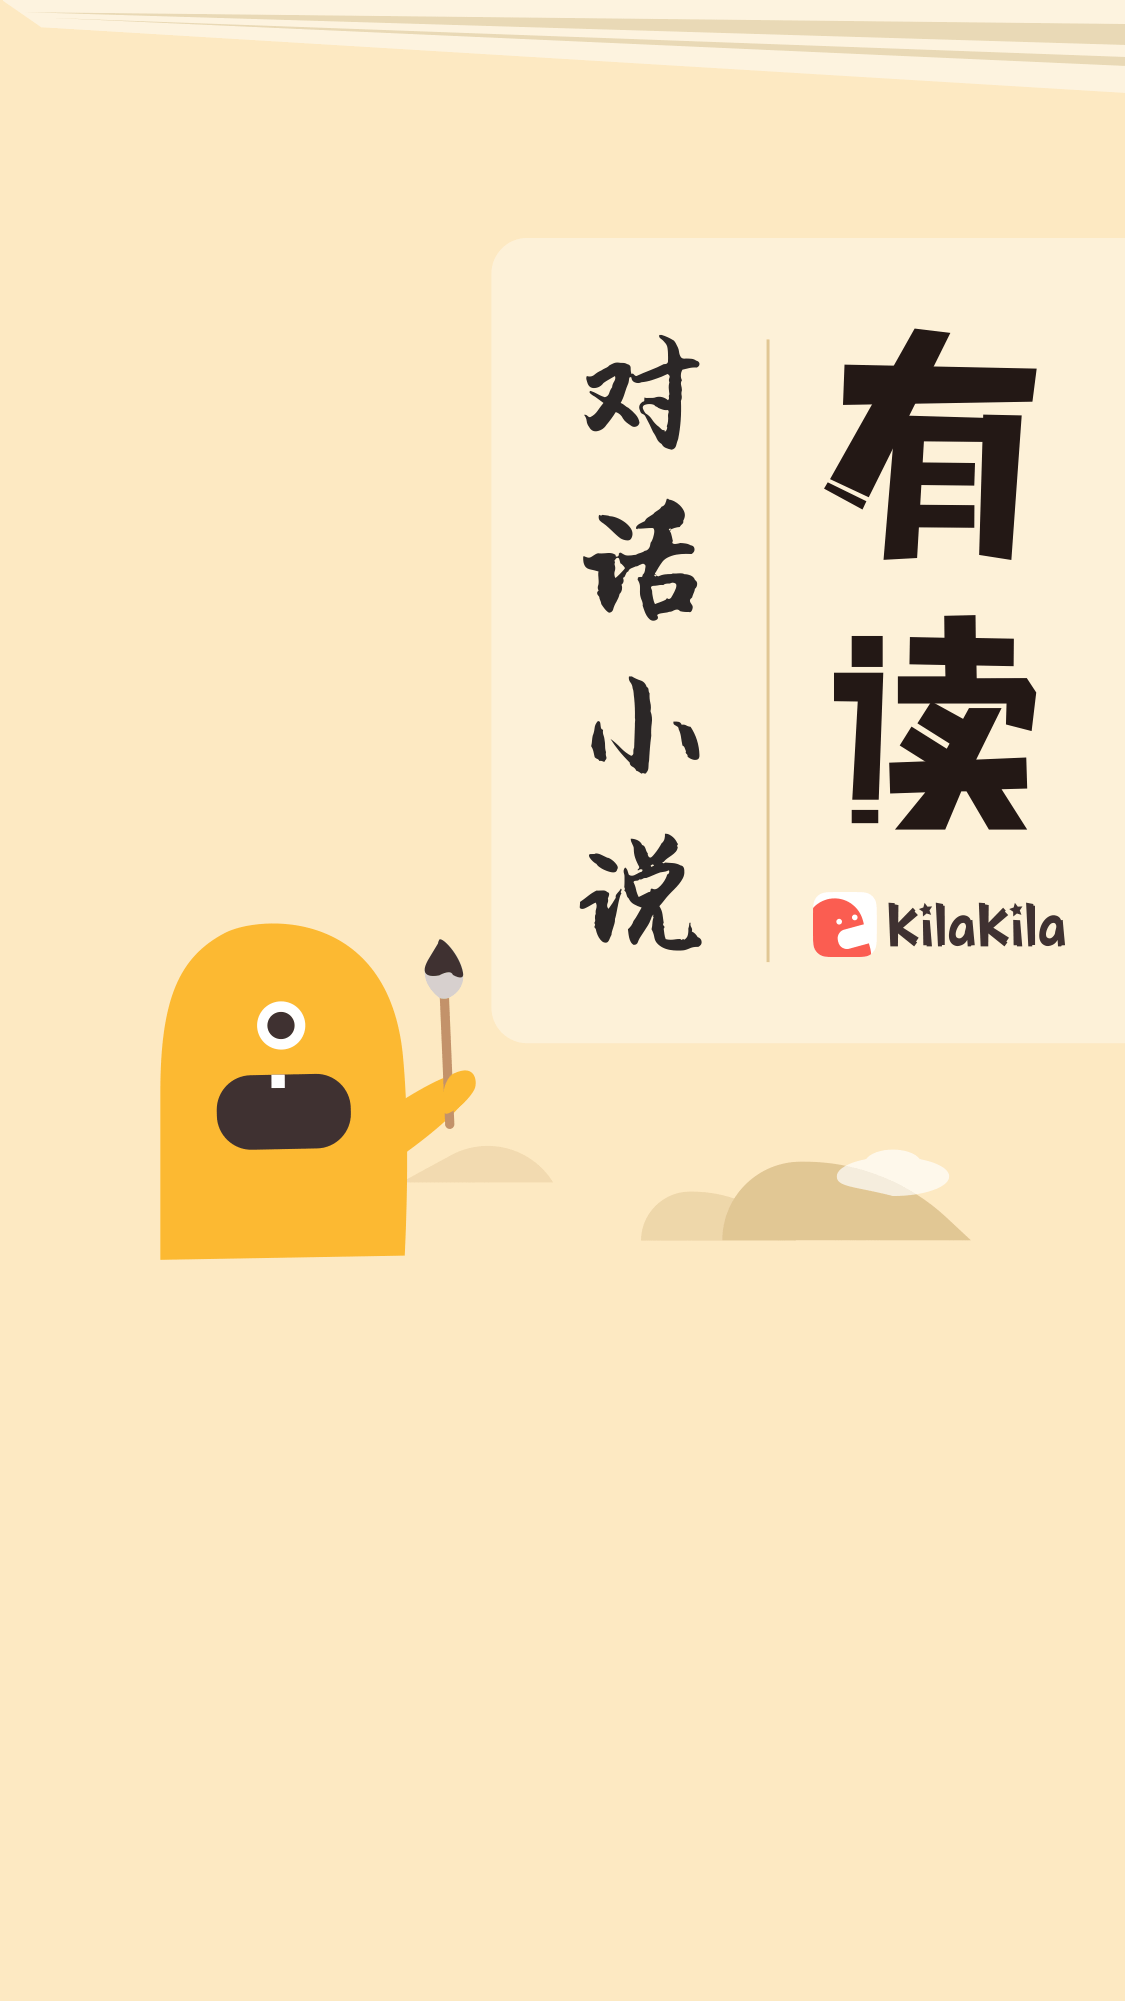 奶破团深夜激情聊天群-KilaKila直播